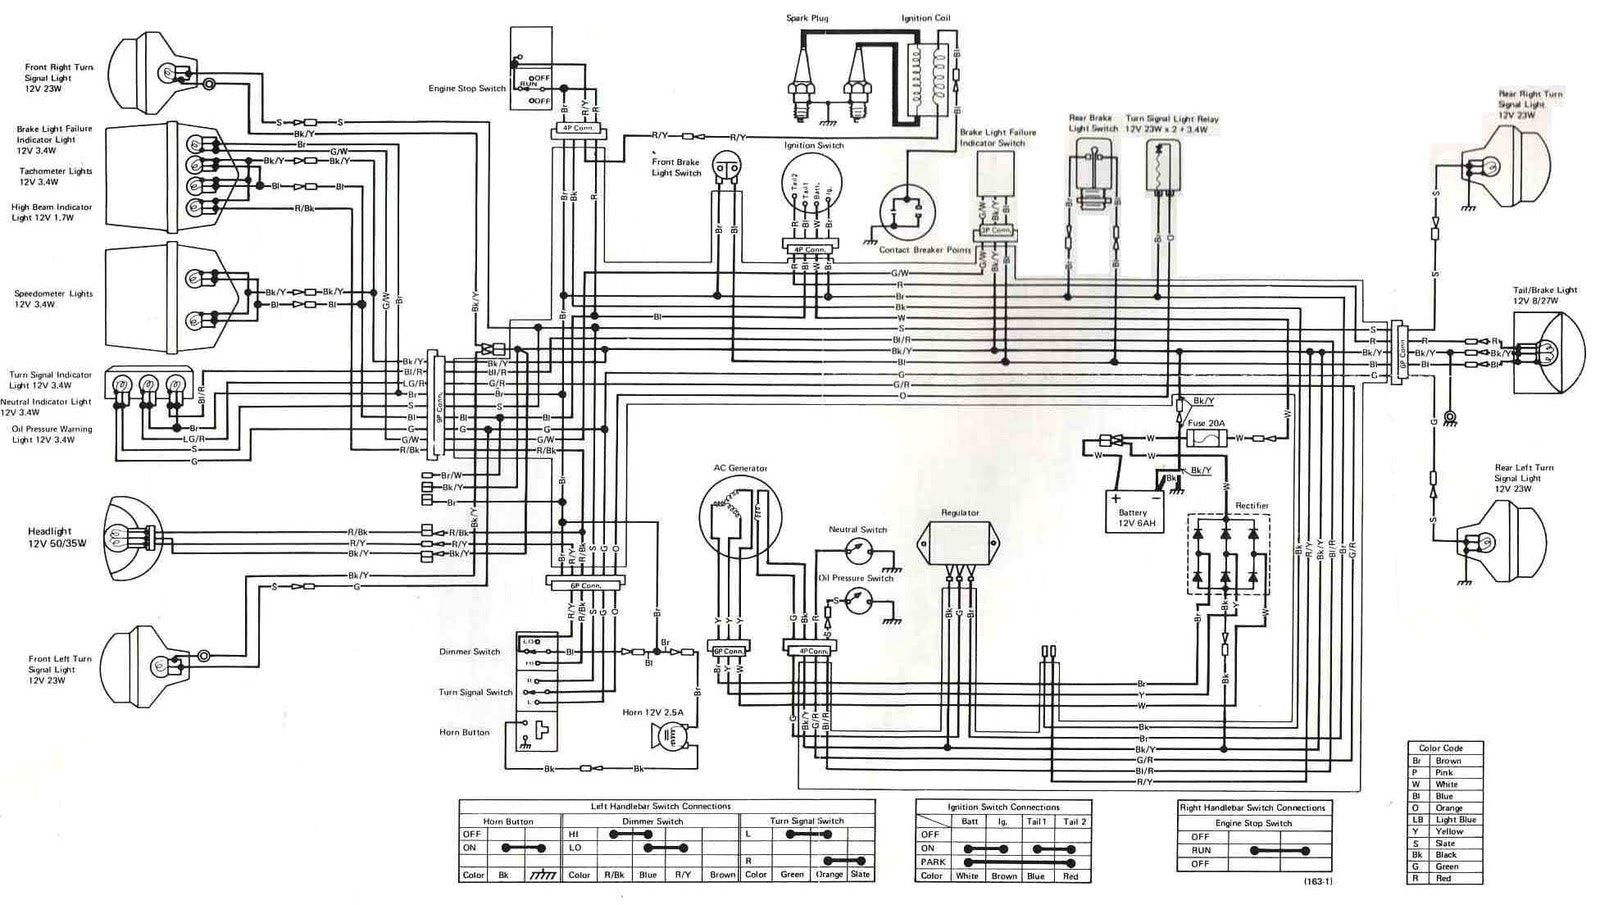 1976 Kawasaki Km 100 Wiring Diagram | Wiring Library